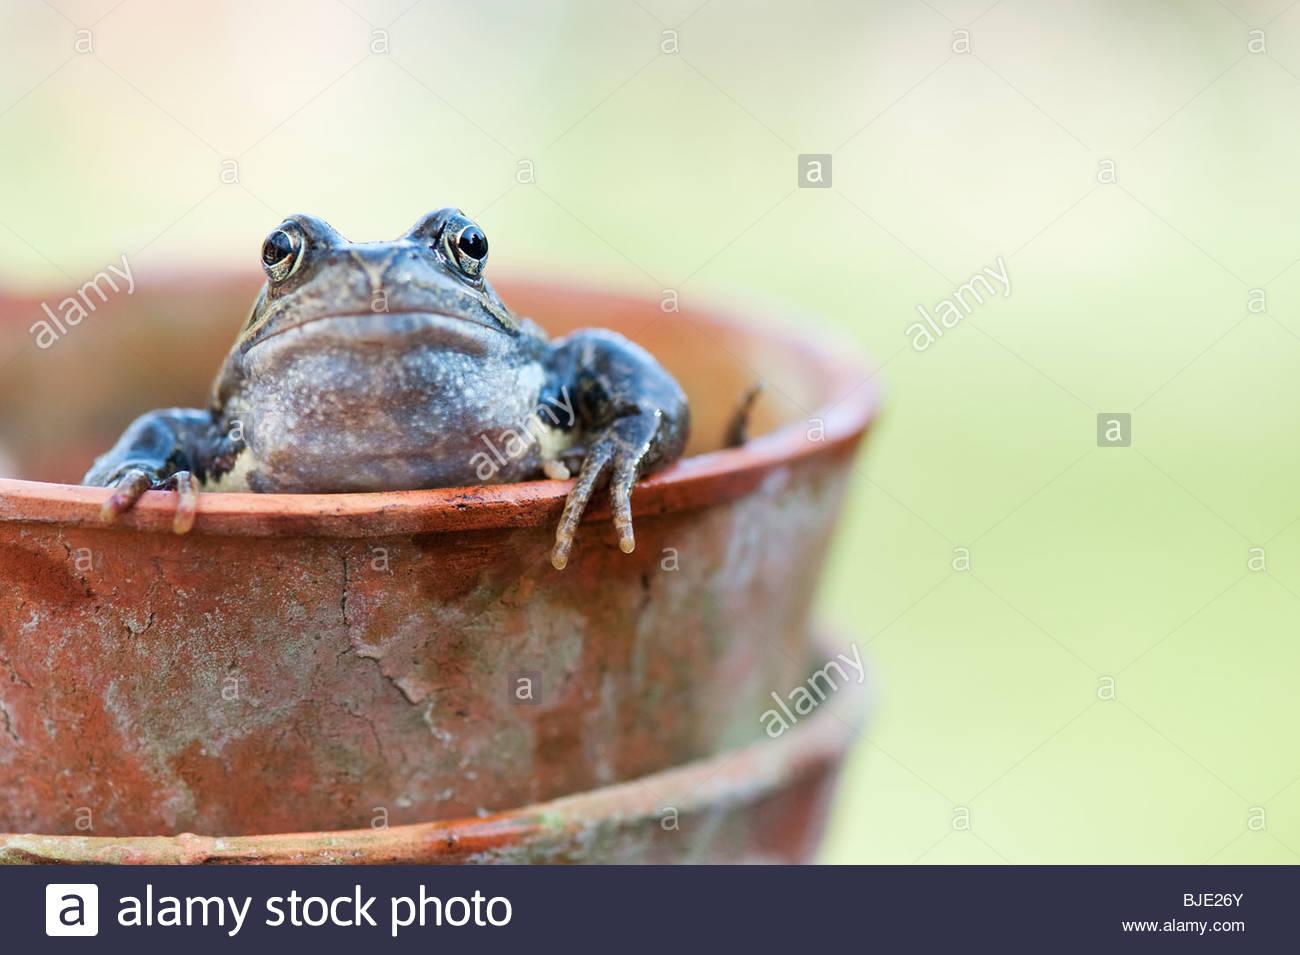 frog legs stockfotos frog legs bilder alamy. Black Bedroom Furniture Sets. Home Design Ideas